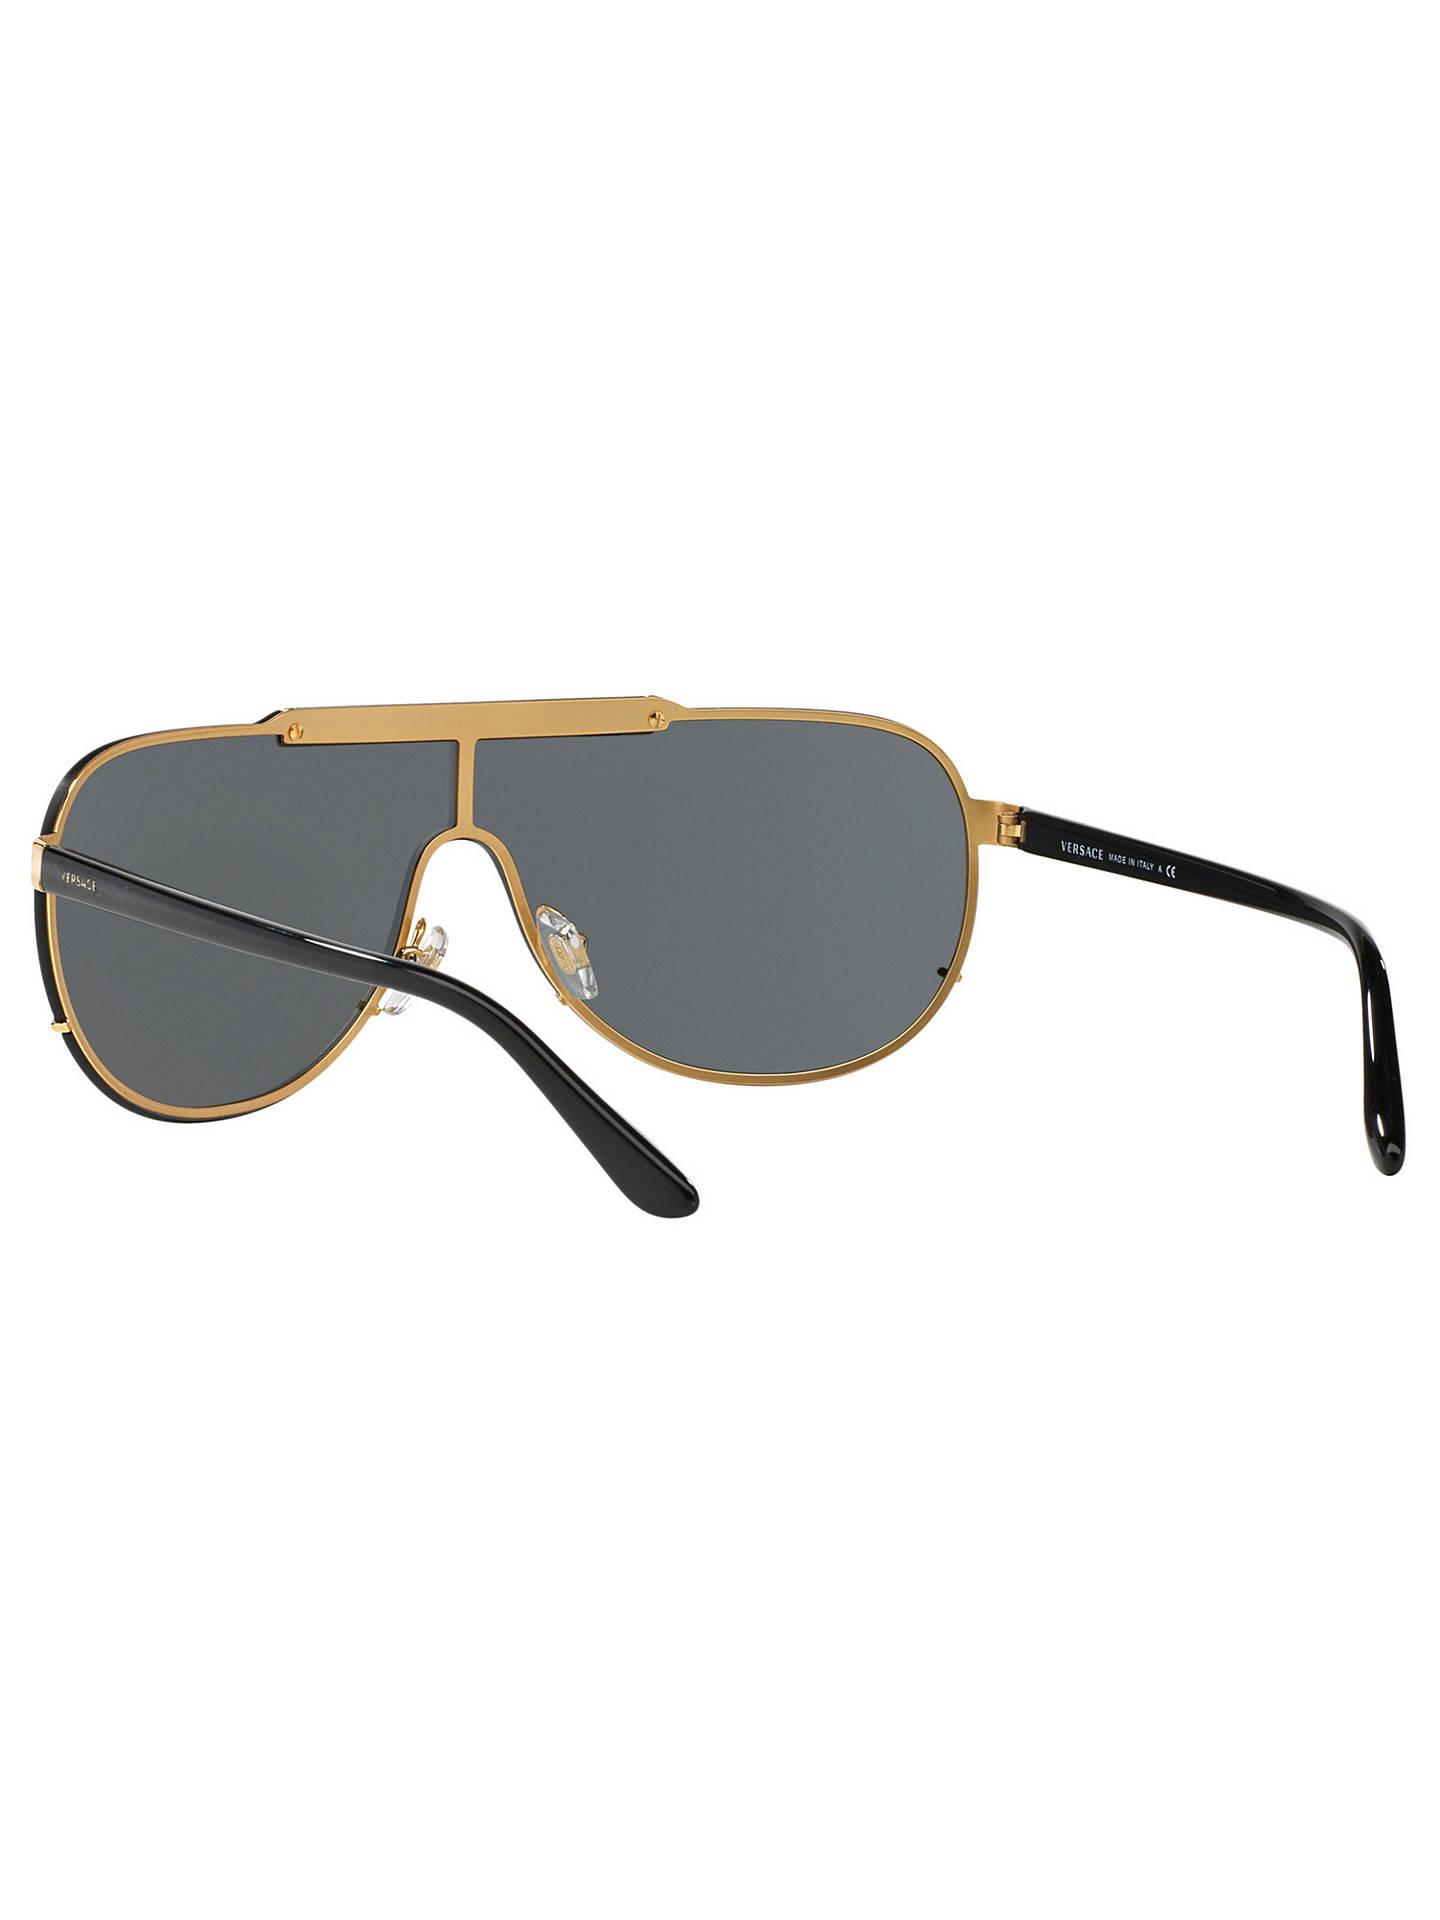 68dc7febce ... Buy Versace VE2140 Aviator Sunglasses